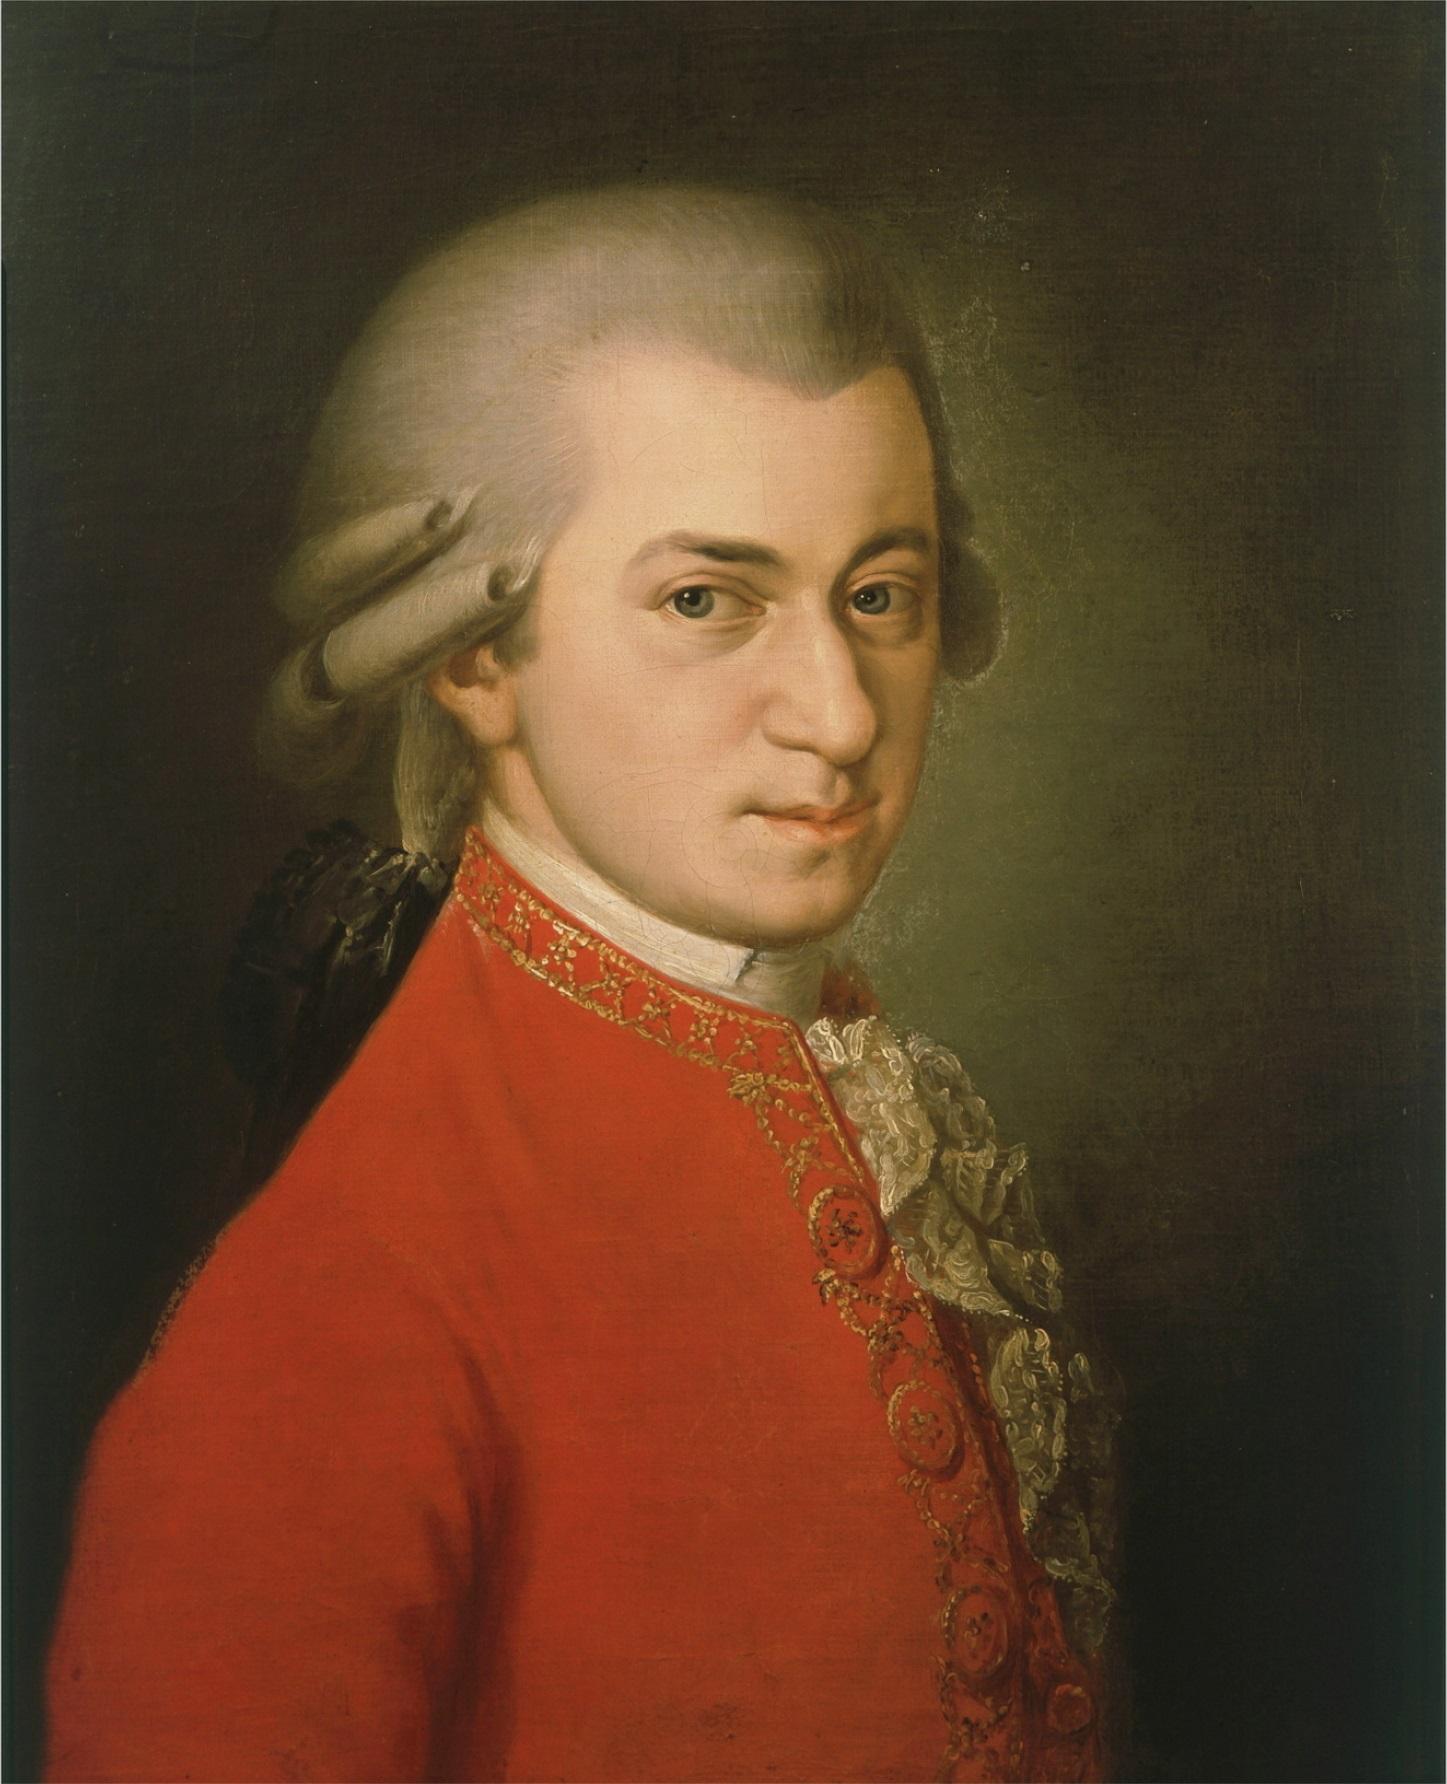 [BLOG POST] Mozart and epilepsy: the rhythm beats on